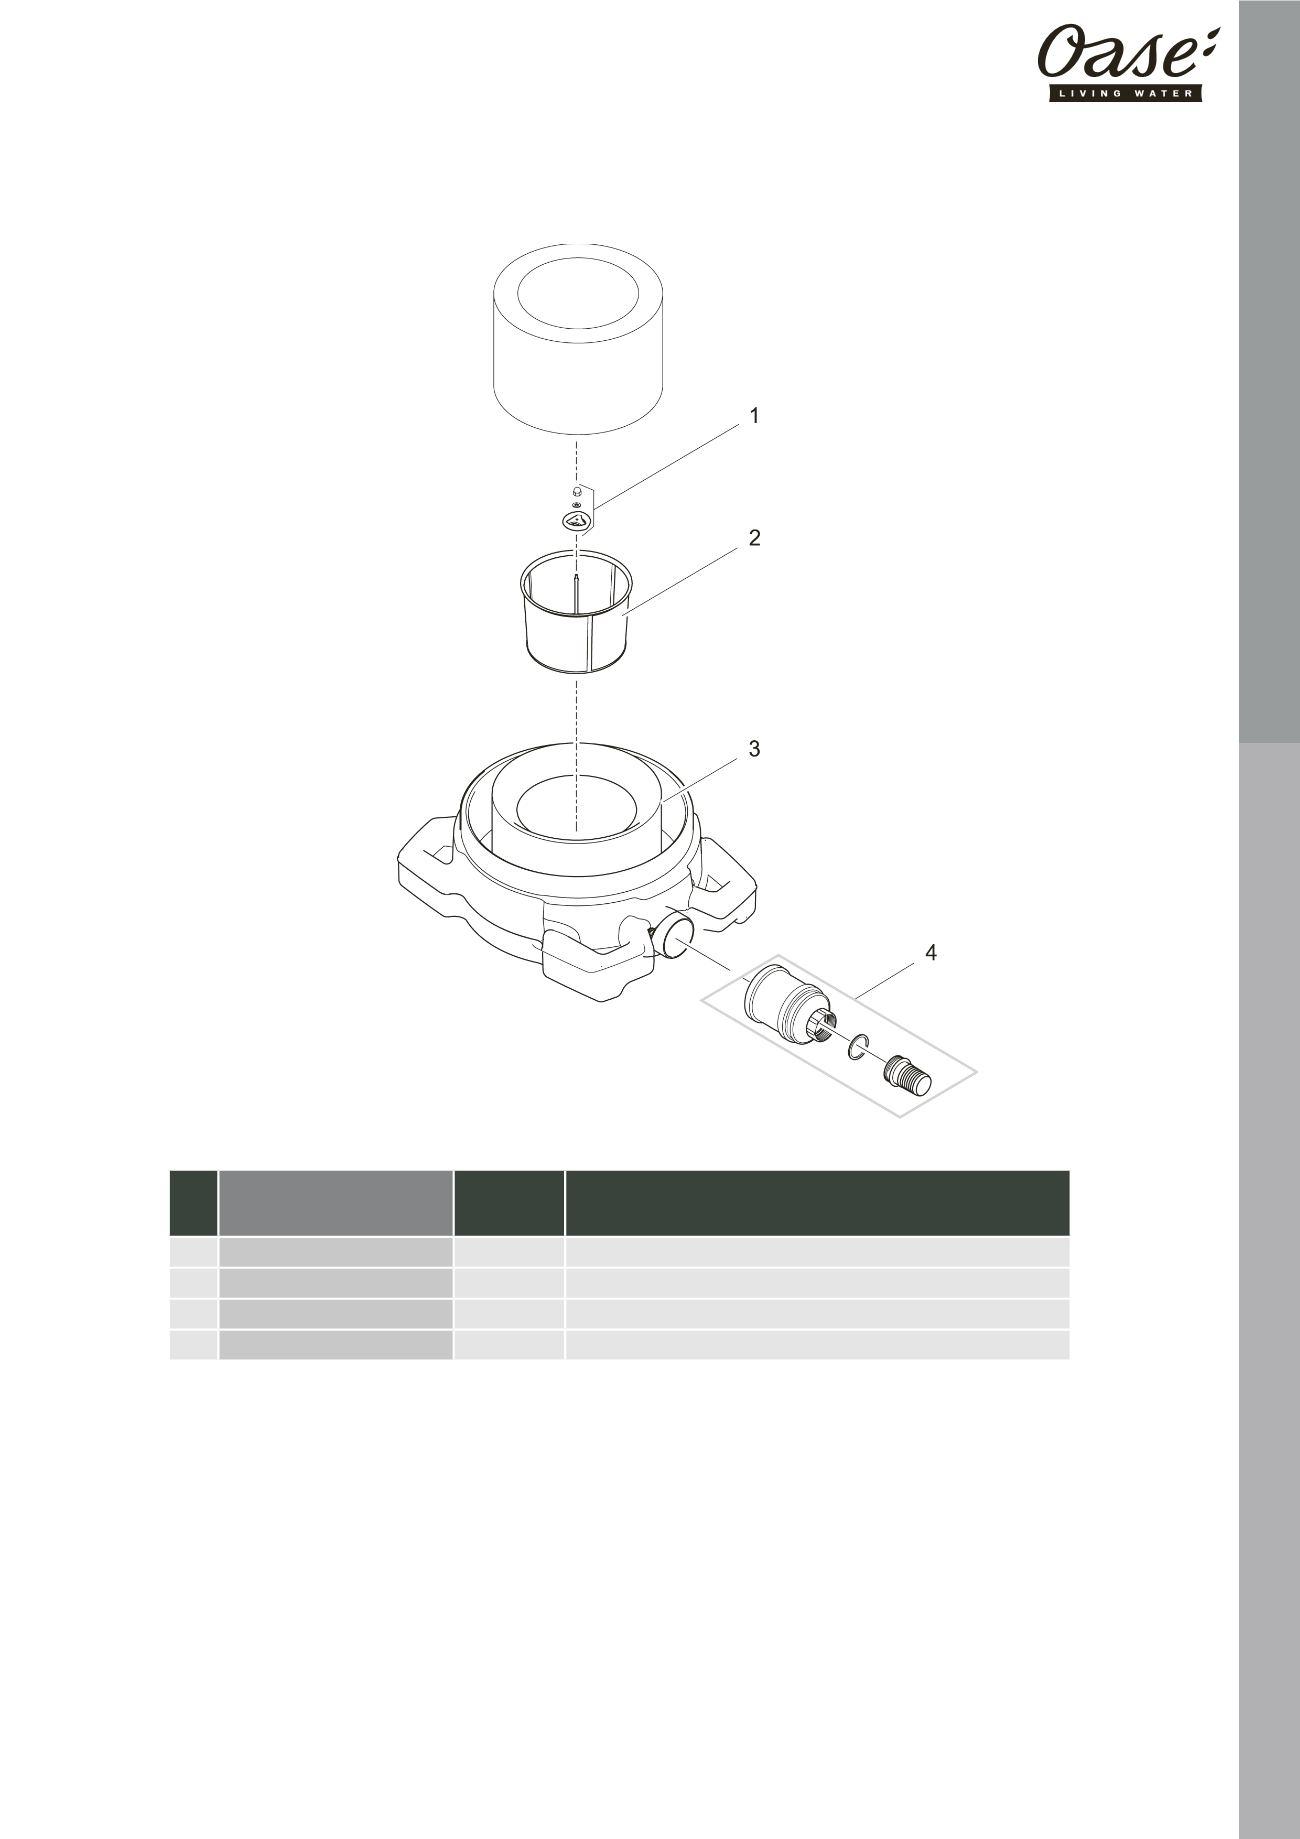 Oase onderdelen catalogus 2013 - Catalogus personeel decor pdf ...